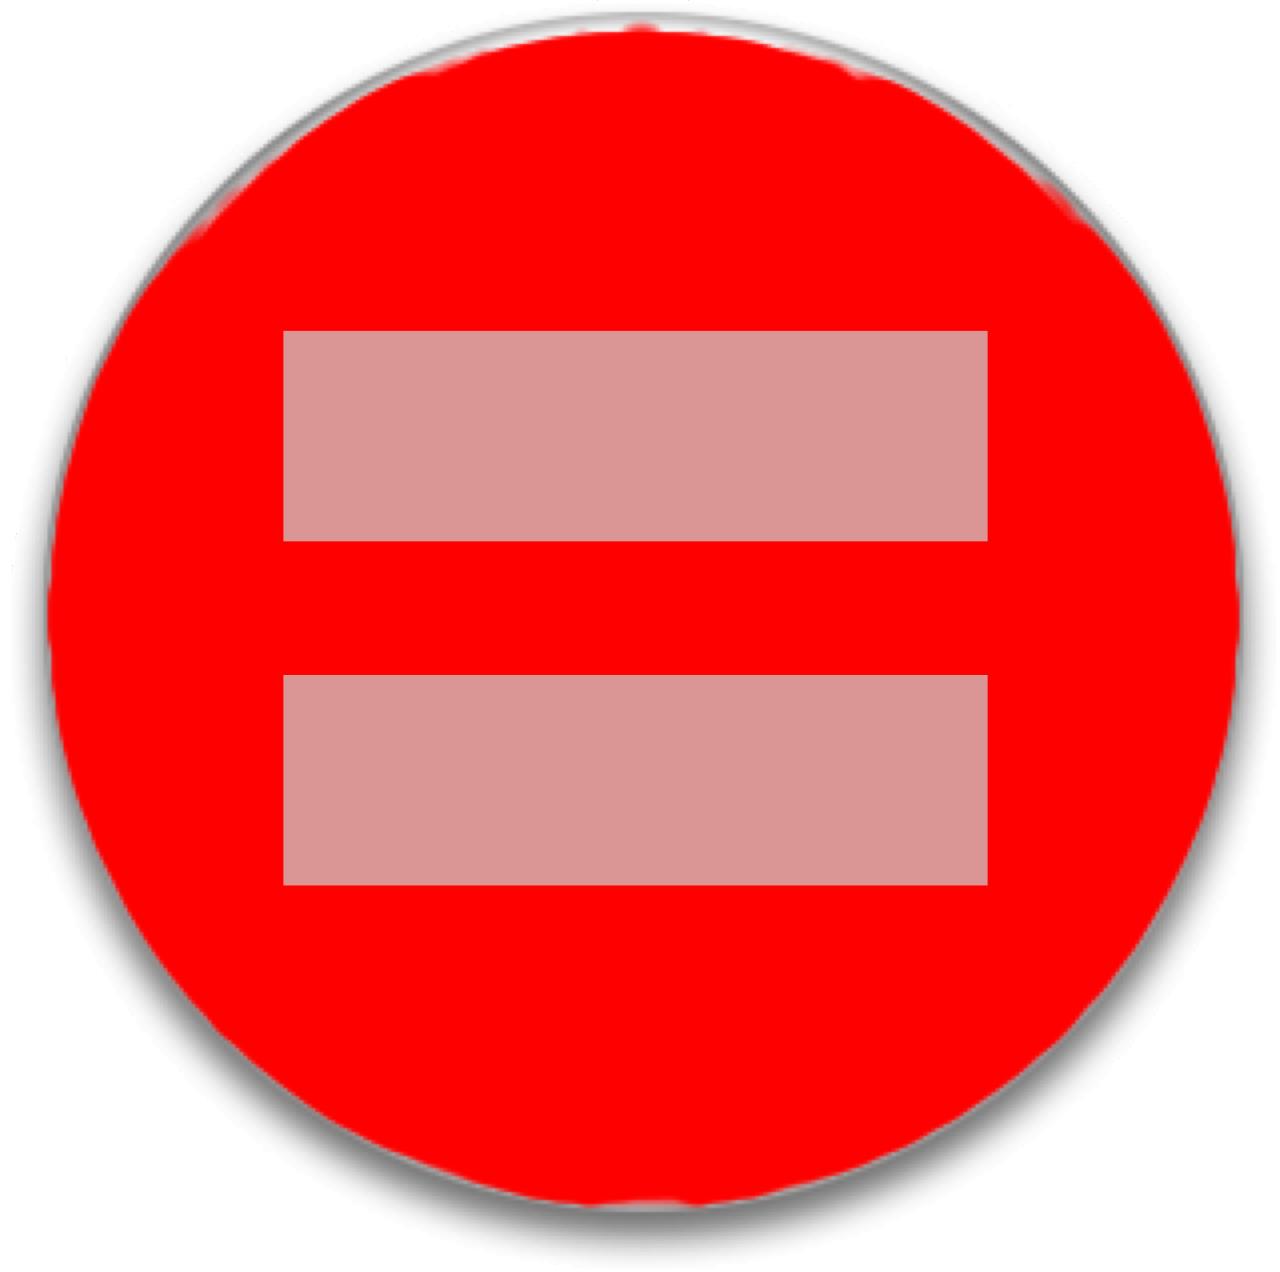 Equals Symbol Transparent Image